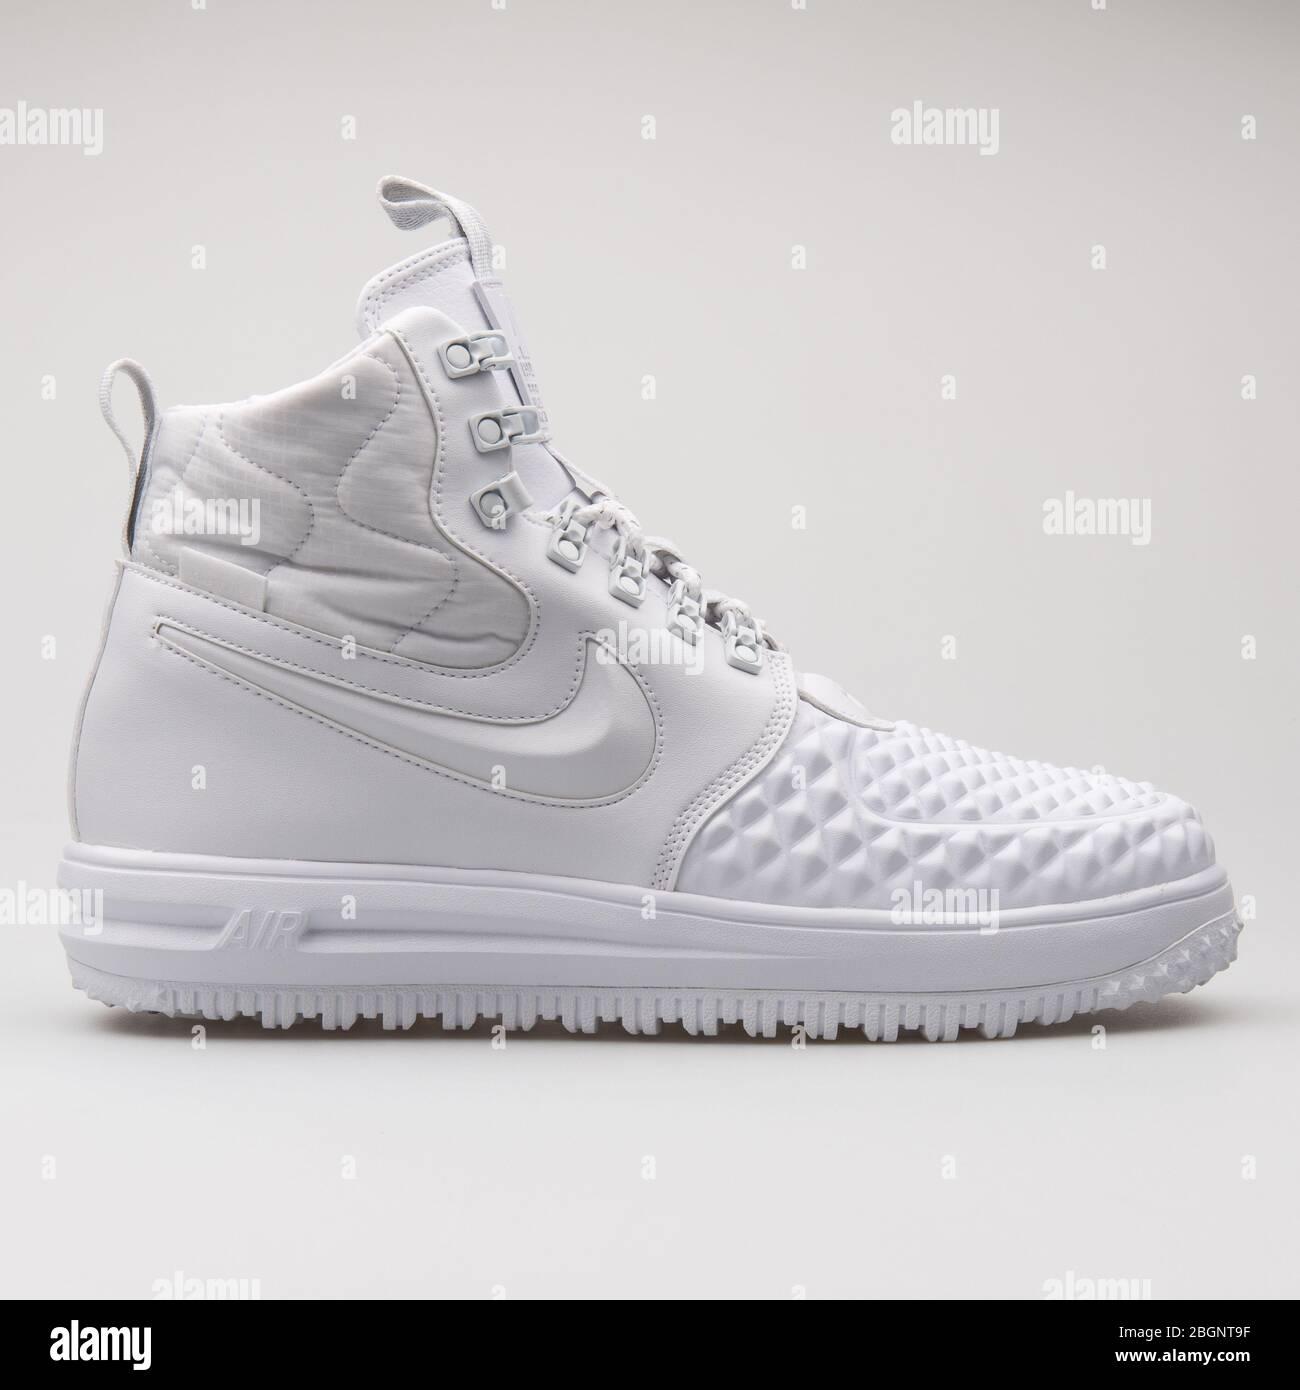 cuatro veces Fiel cerca  VIENNA, AUSTRIA - AUGUST 24, 2017: Nike Lunar Force 1 Duckboot 17 Premium  white sneaker on white background Stock Photo - Alamy